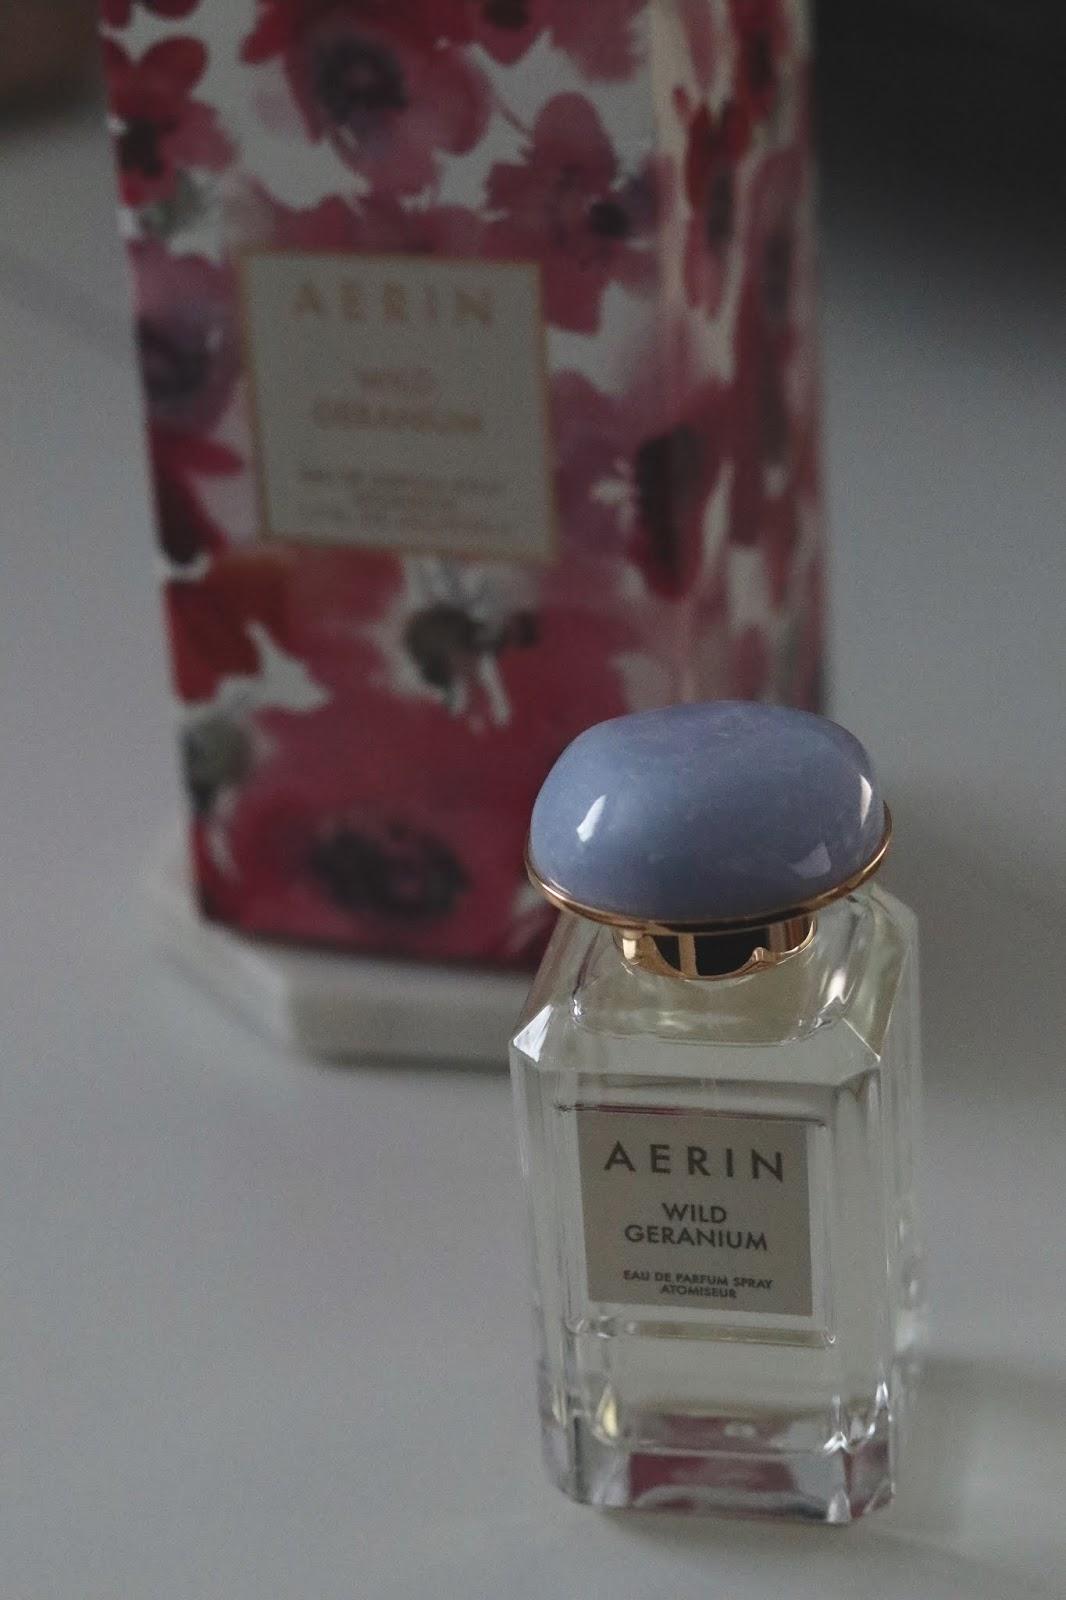 AERIN Wild Geranium eau de parfum: A quick review